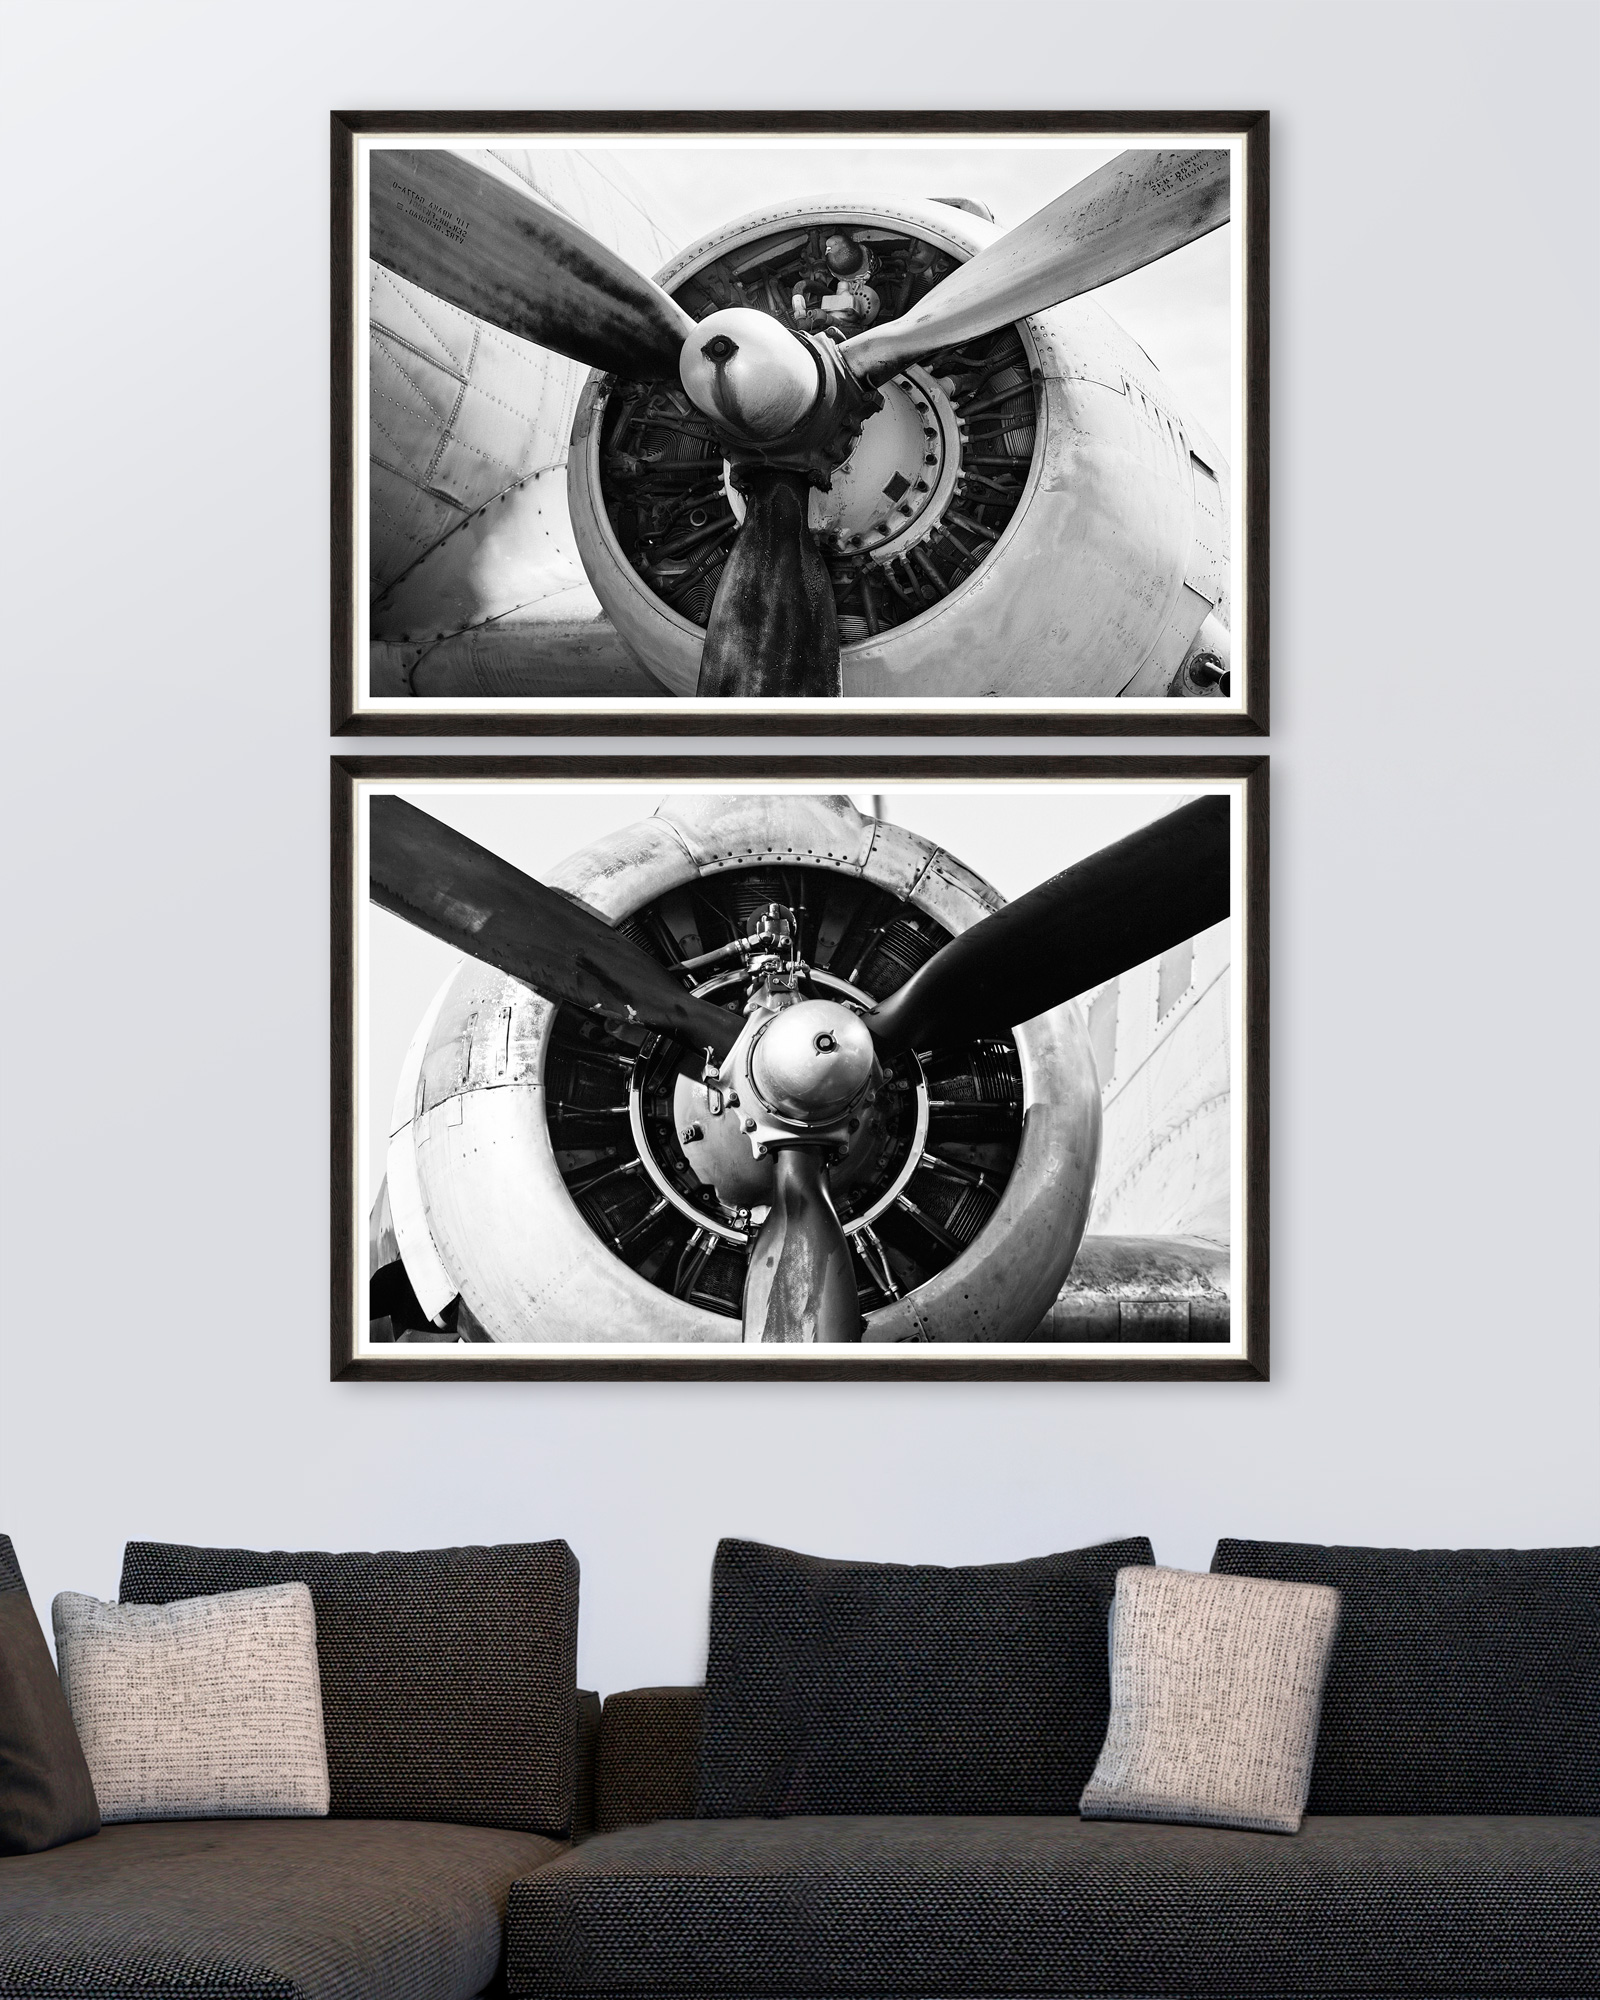 Tablou 2 piese Framed Art Giant Propellers imagine